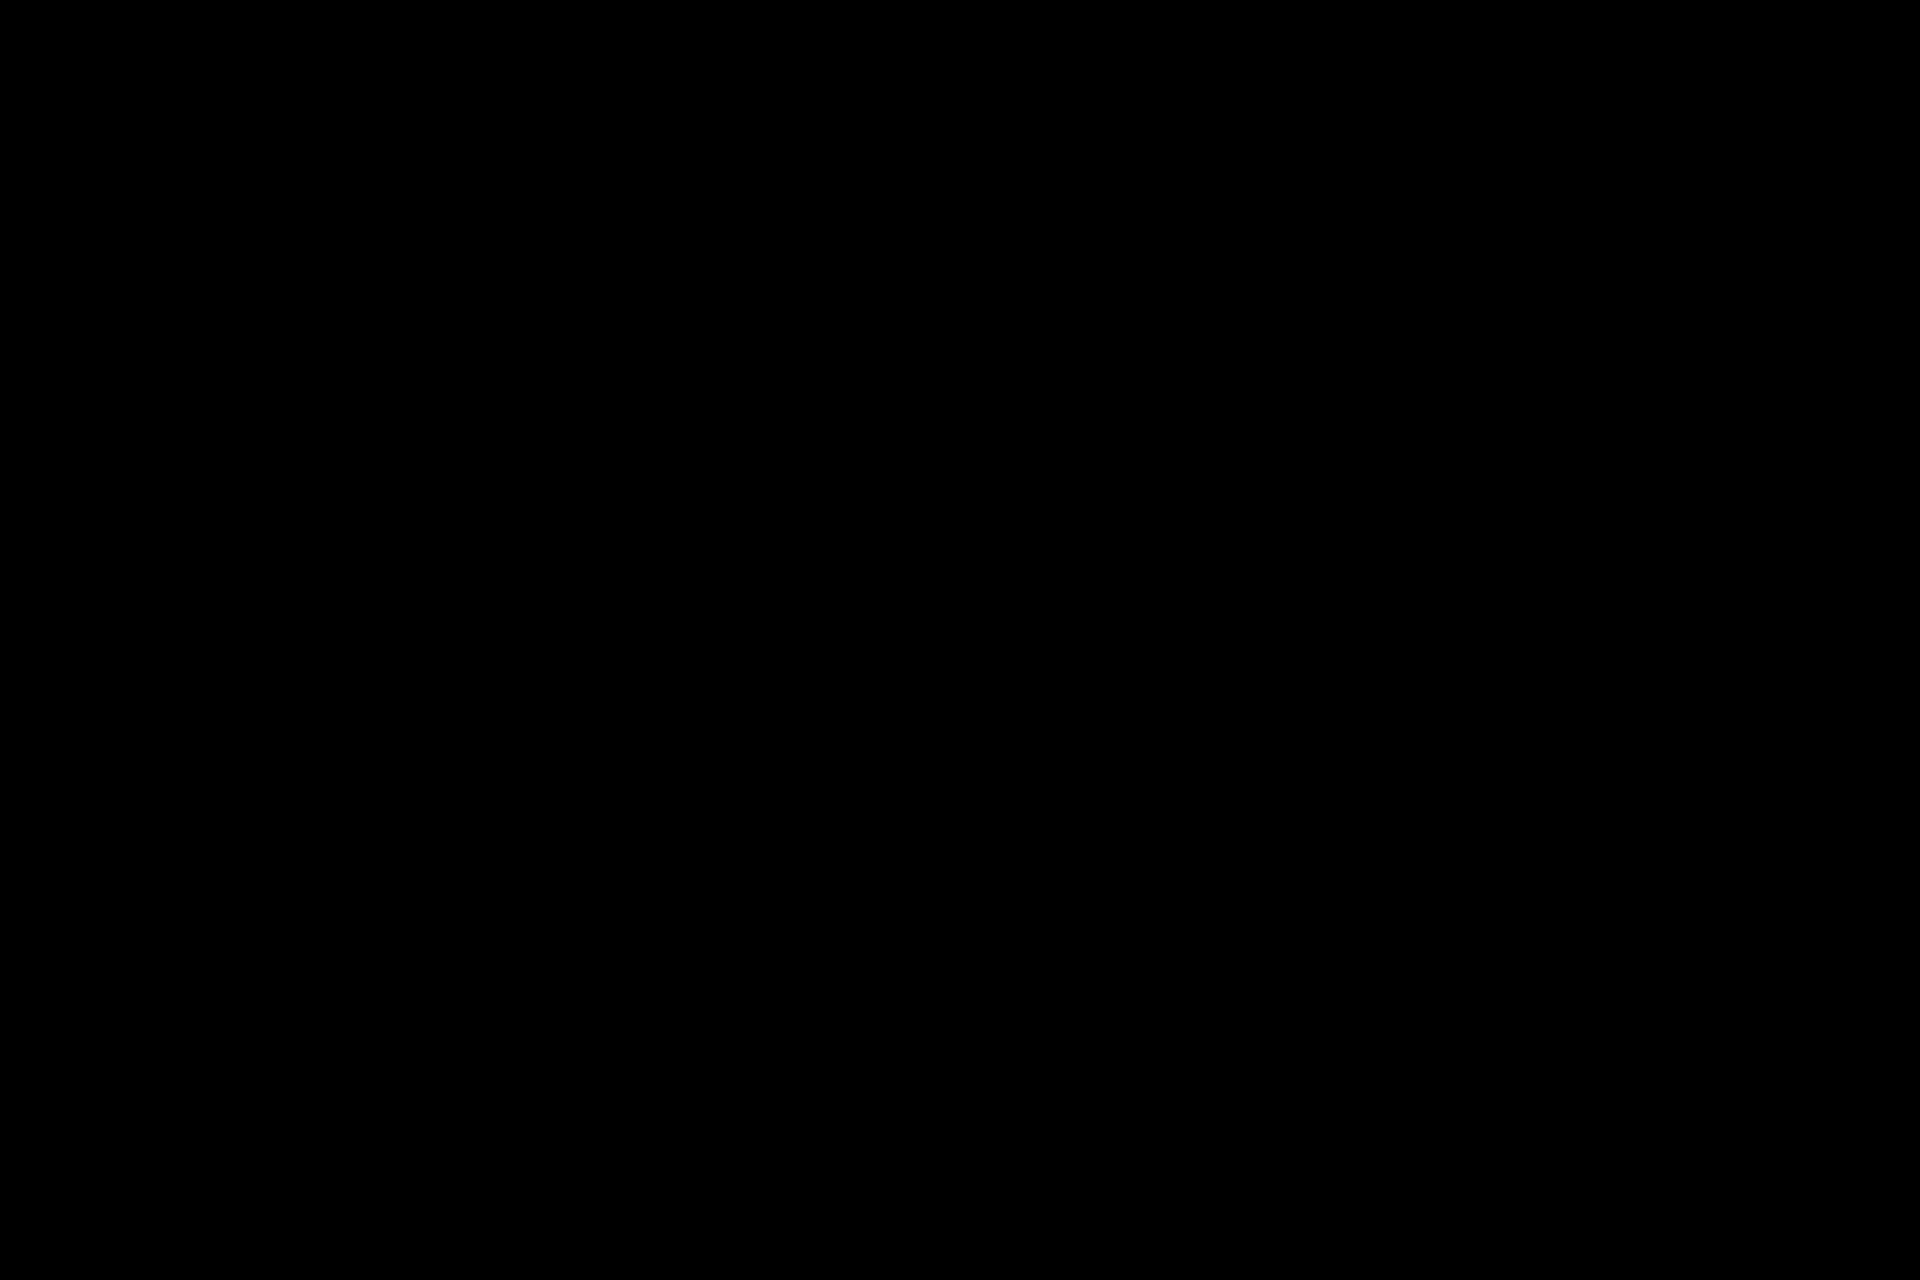 ATOMIC70 - padrão